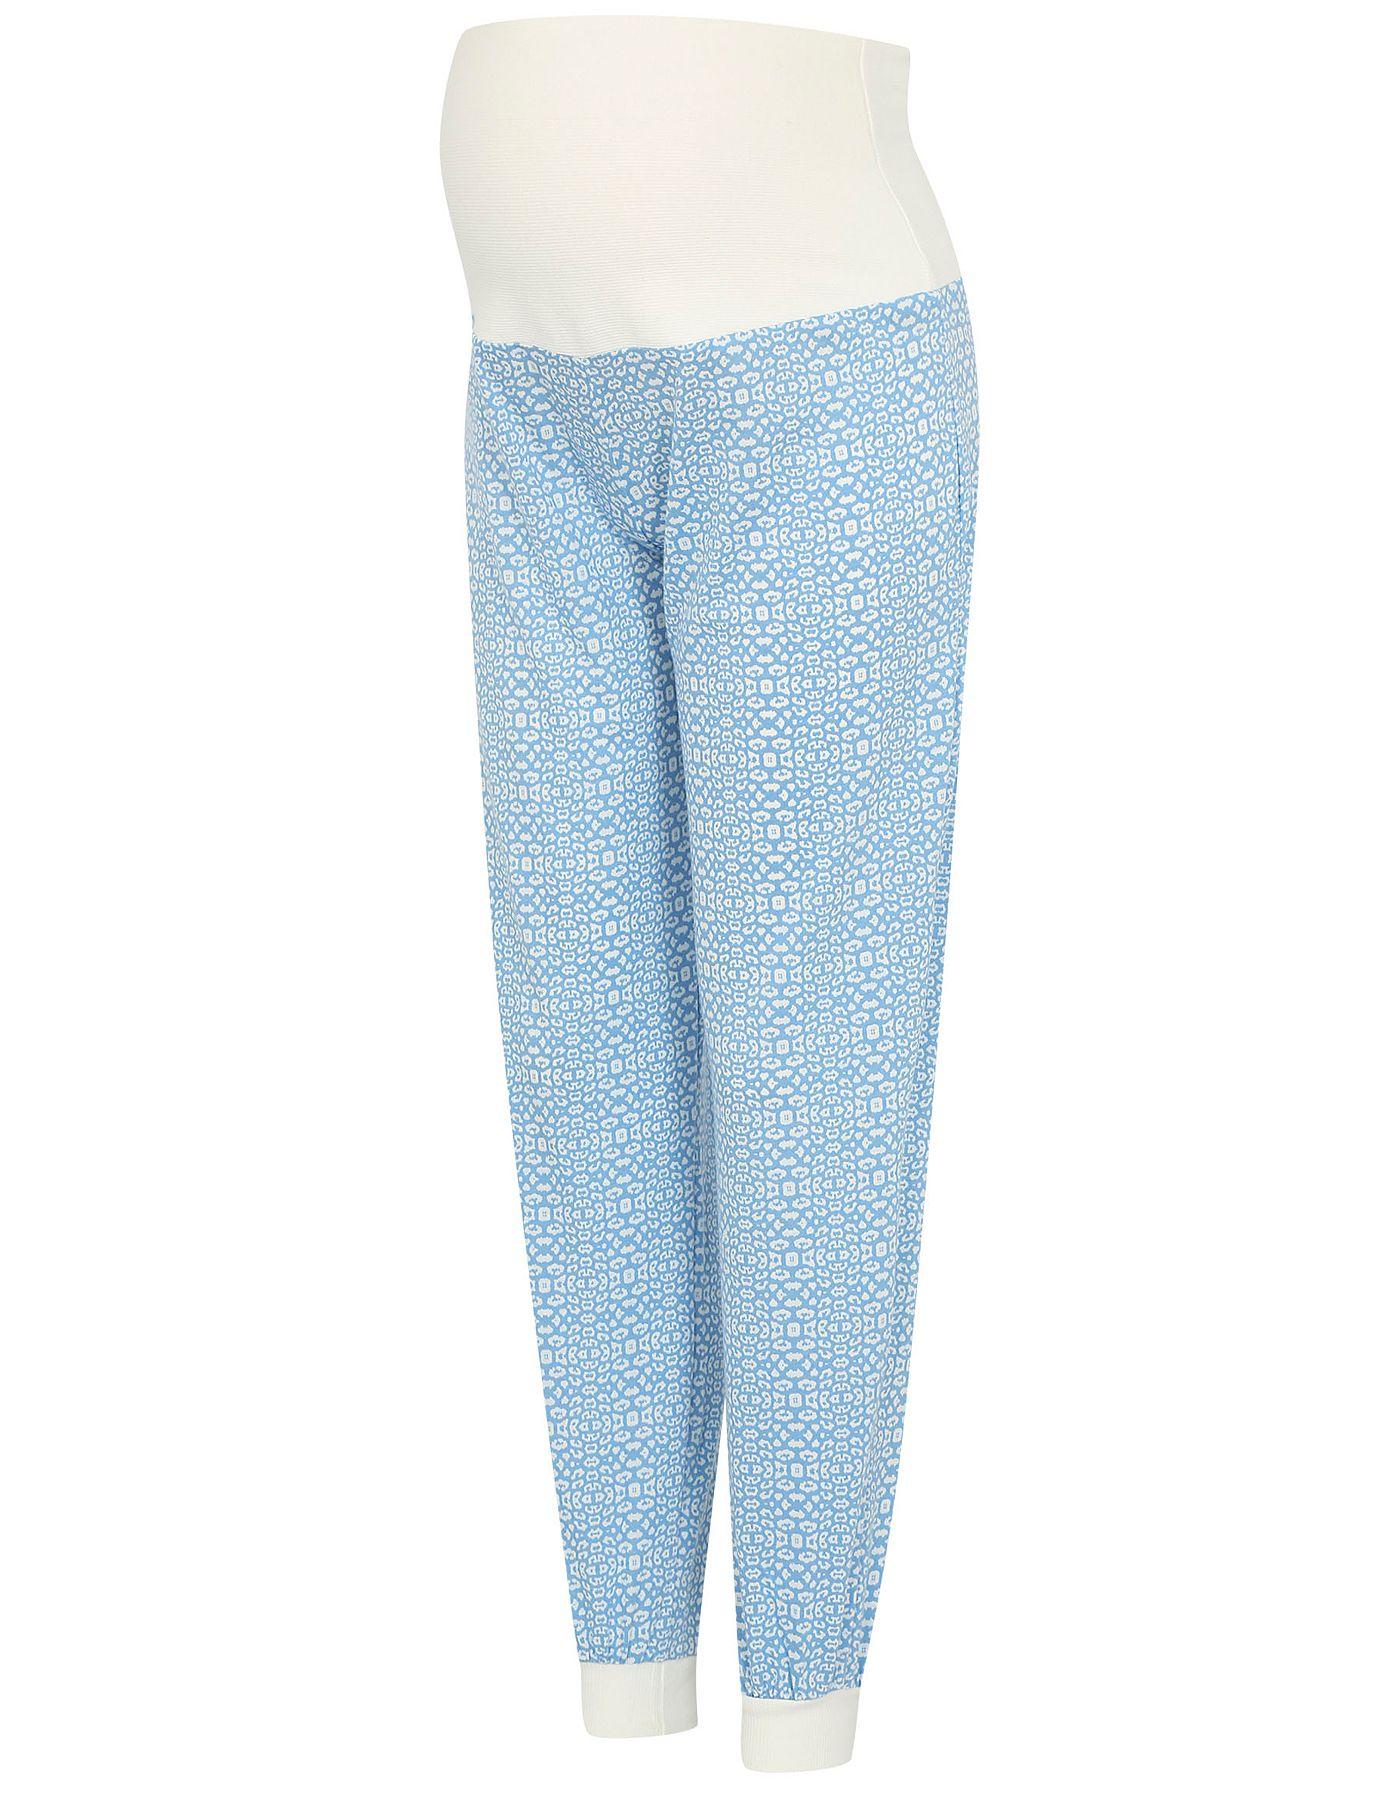 Asda maternity bootcut jeans